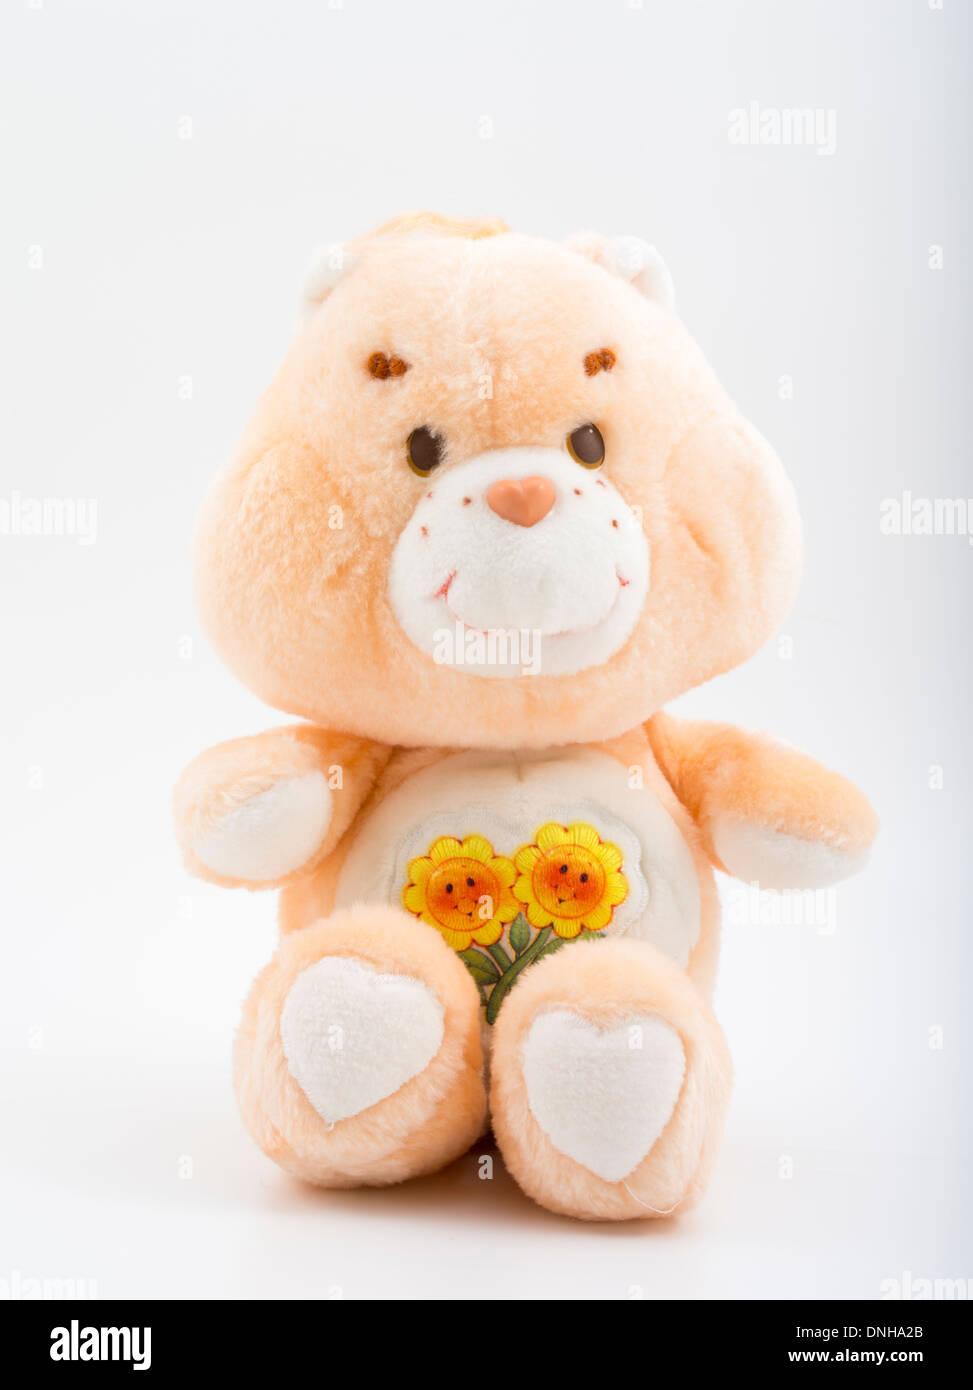 VINTAGE KENNER 1983 CARE BEARS plush doll ' FRIEND BEAR ' - Stock Image